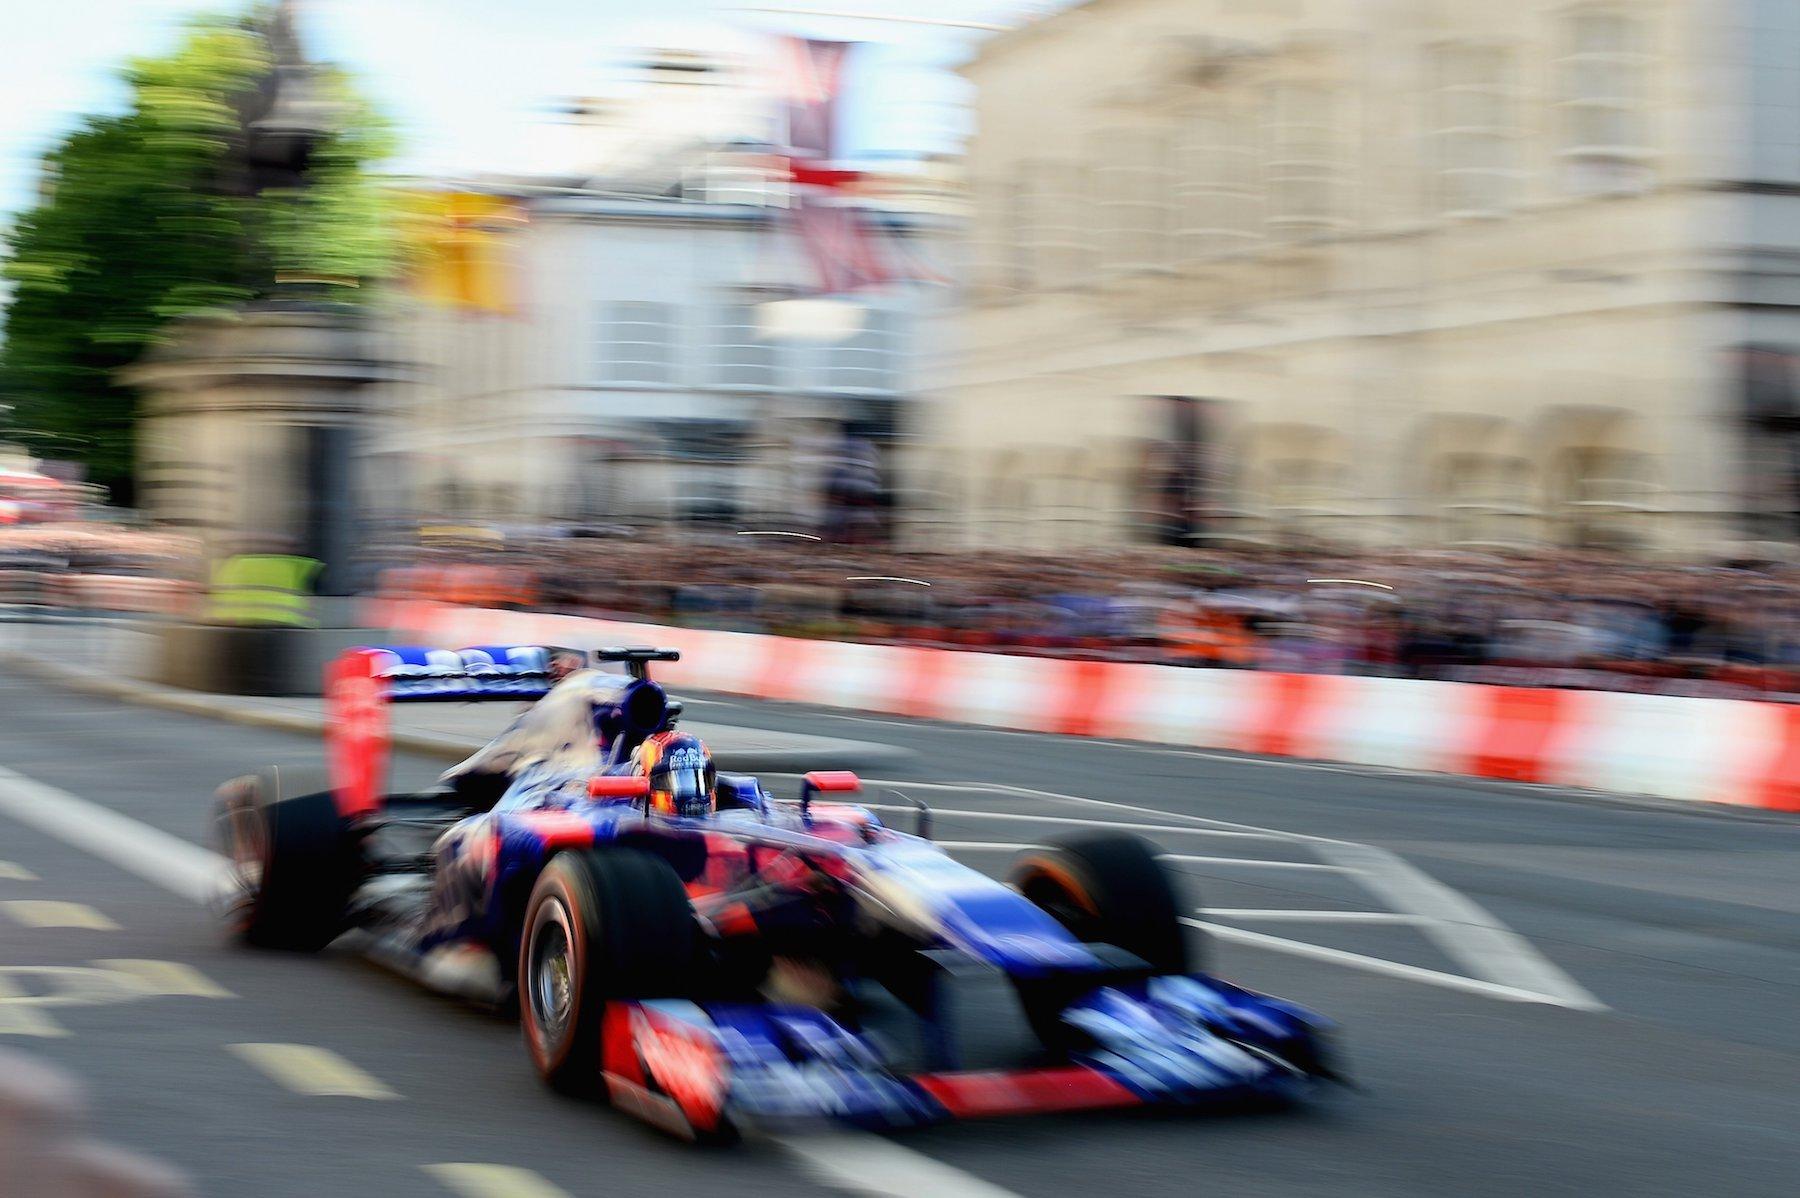 2017 F1 Live London 10 copy.jpg